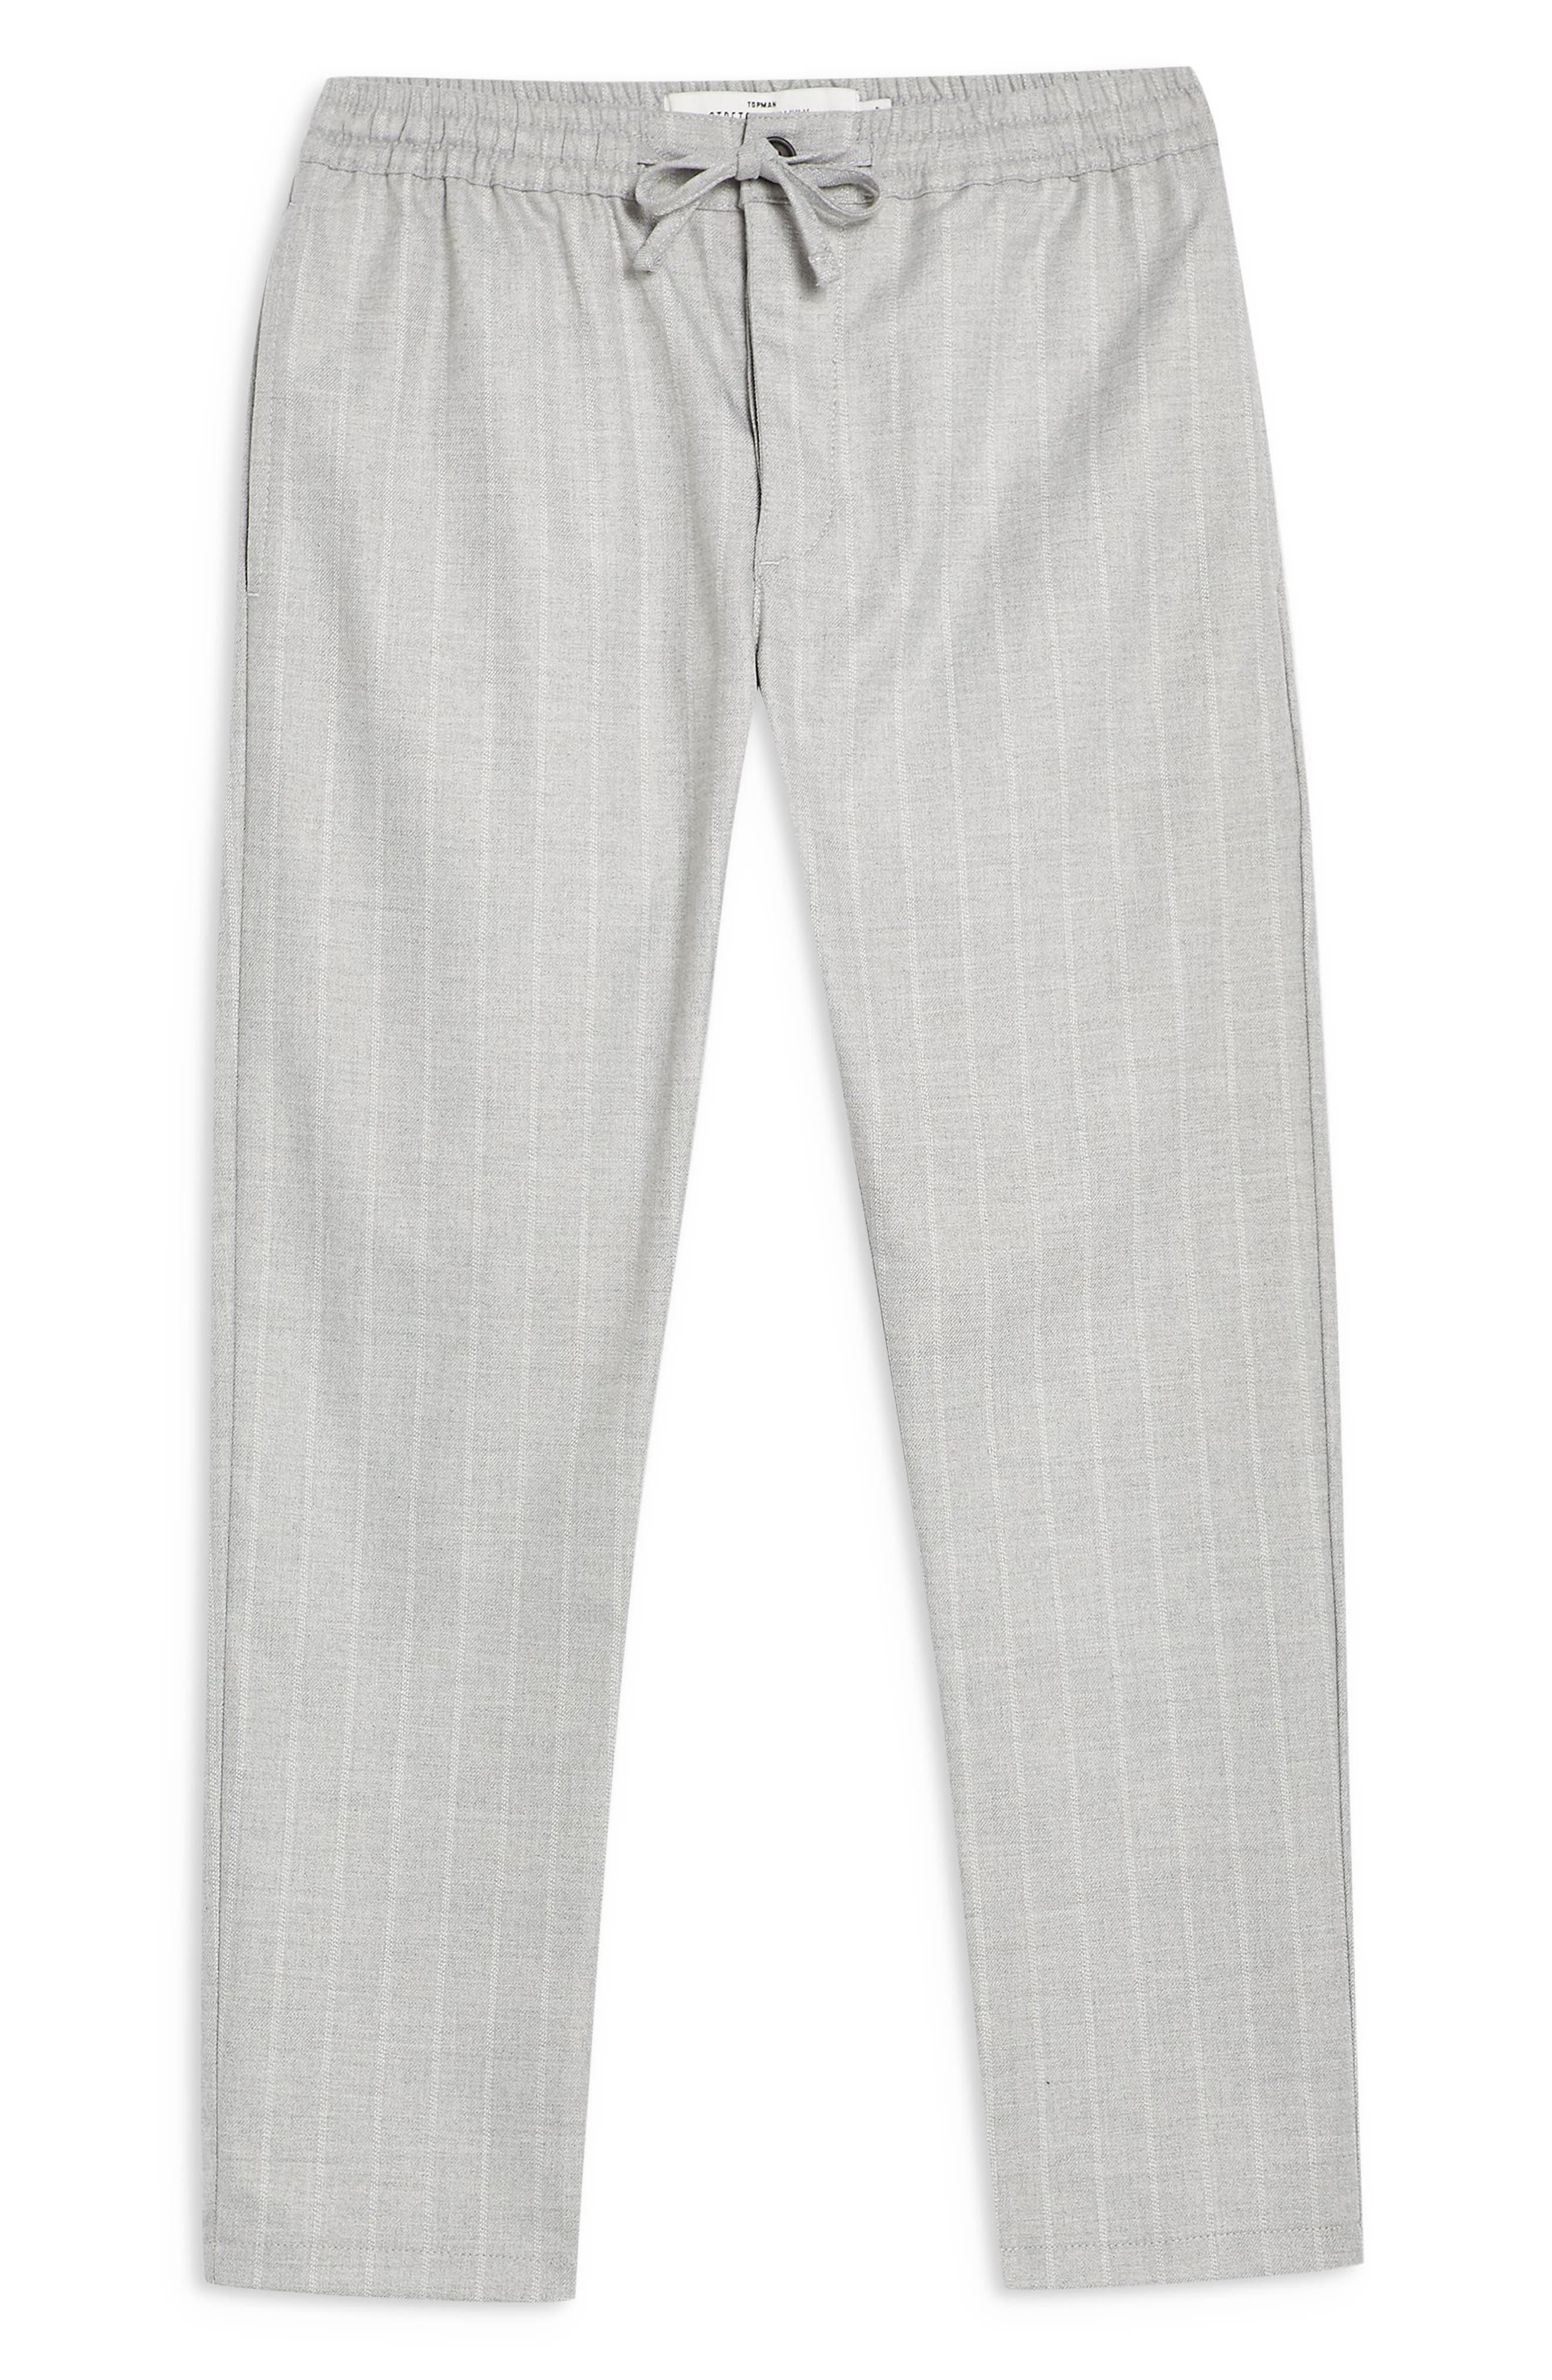 TOPMAN, Skinny Fit Stripe Crop Trousers, Alternate thumbnail 5, color, GREY